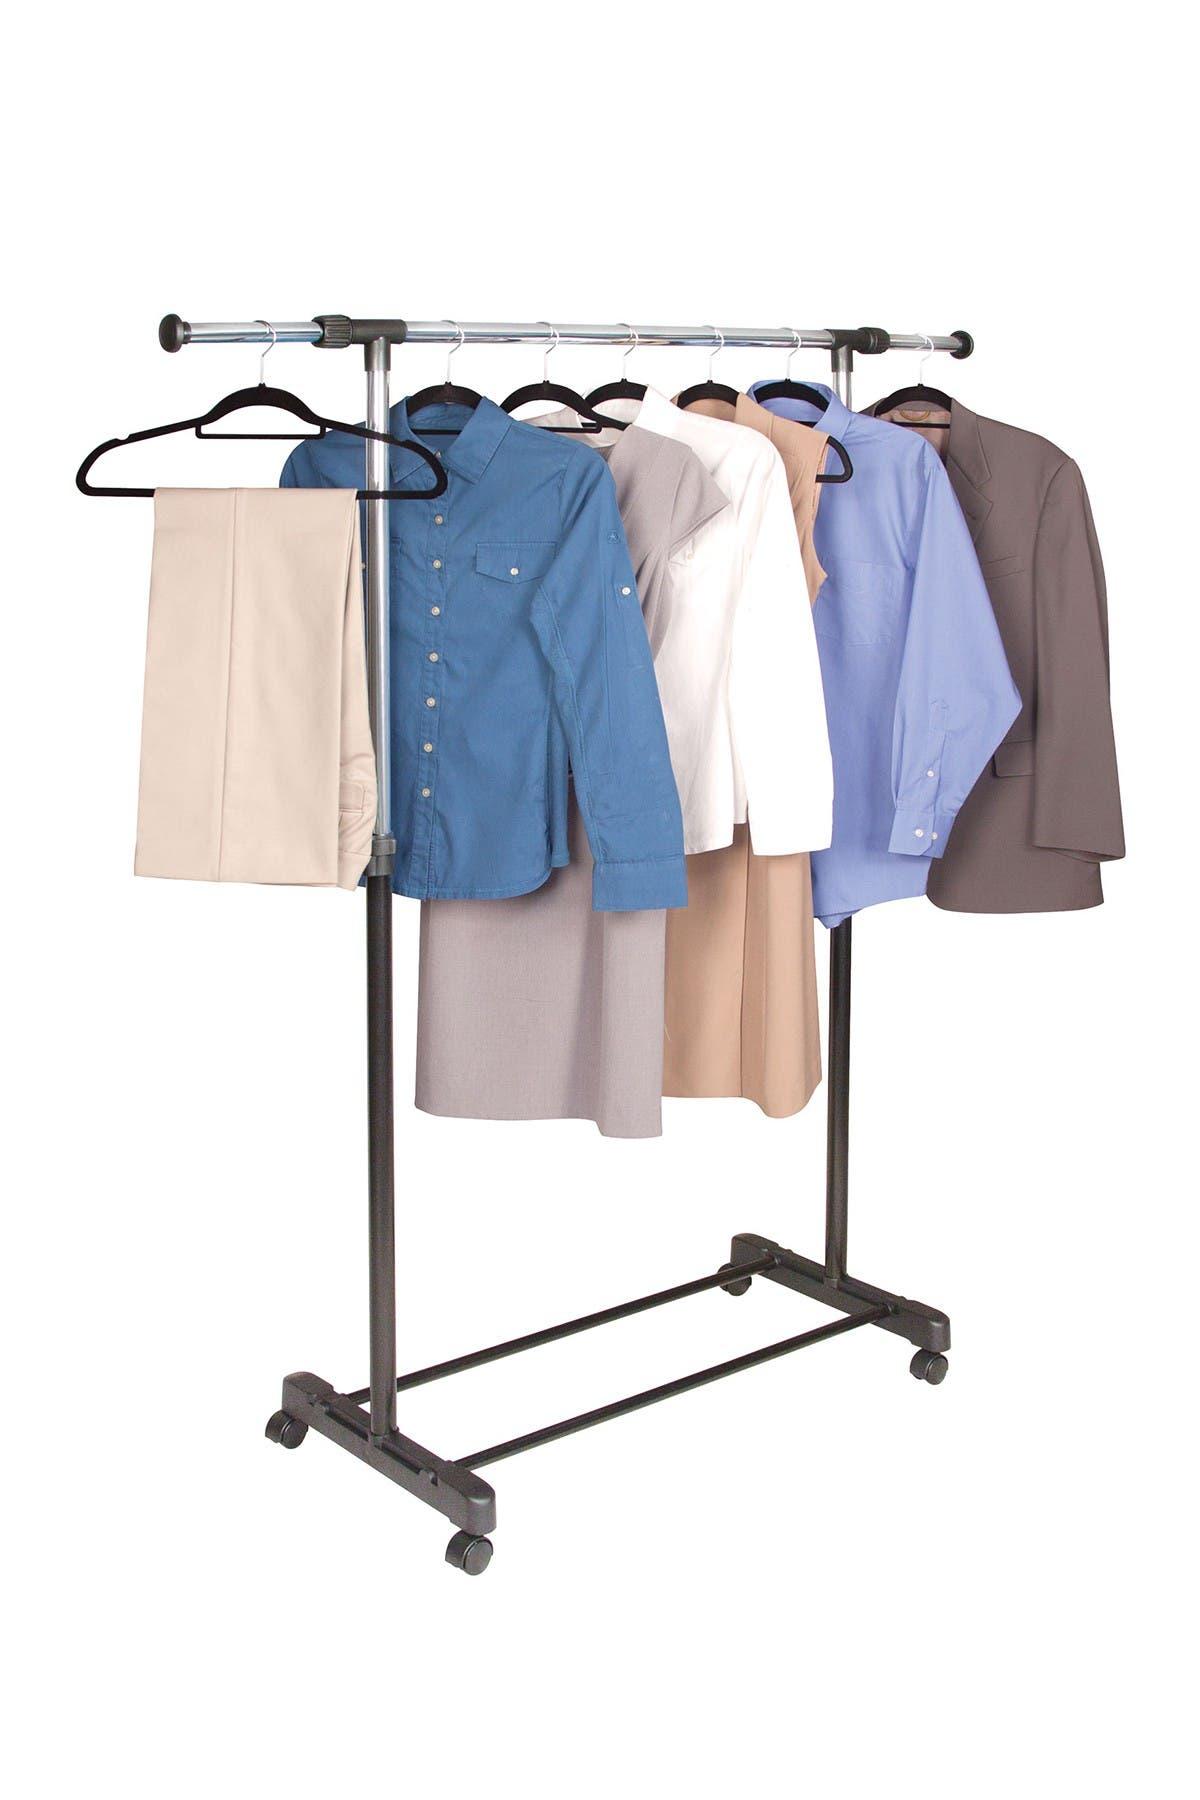 Image of RICHARDS HOMEWARES Extendable Garment Rack